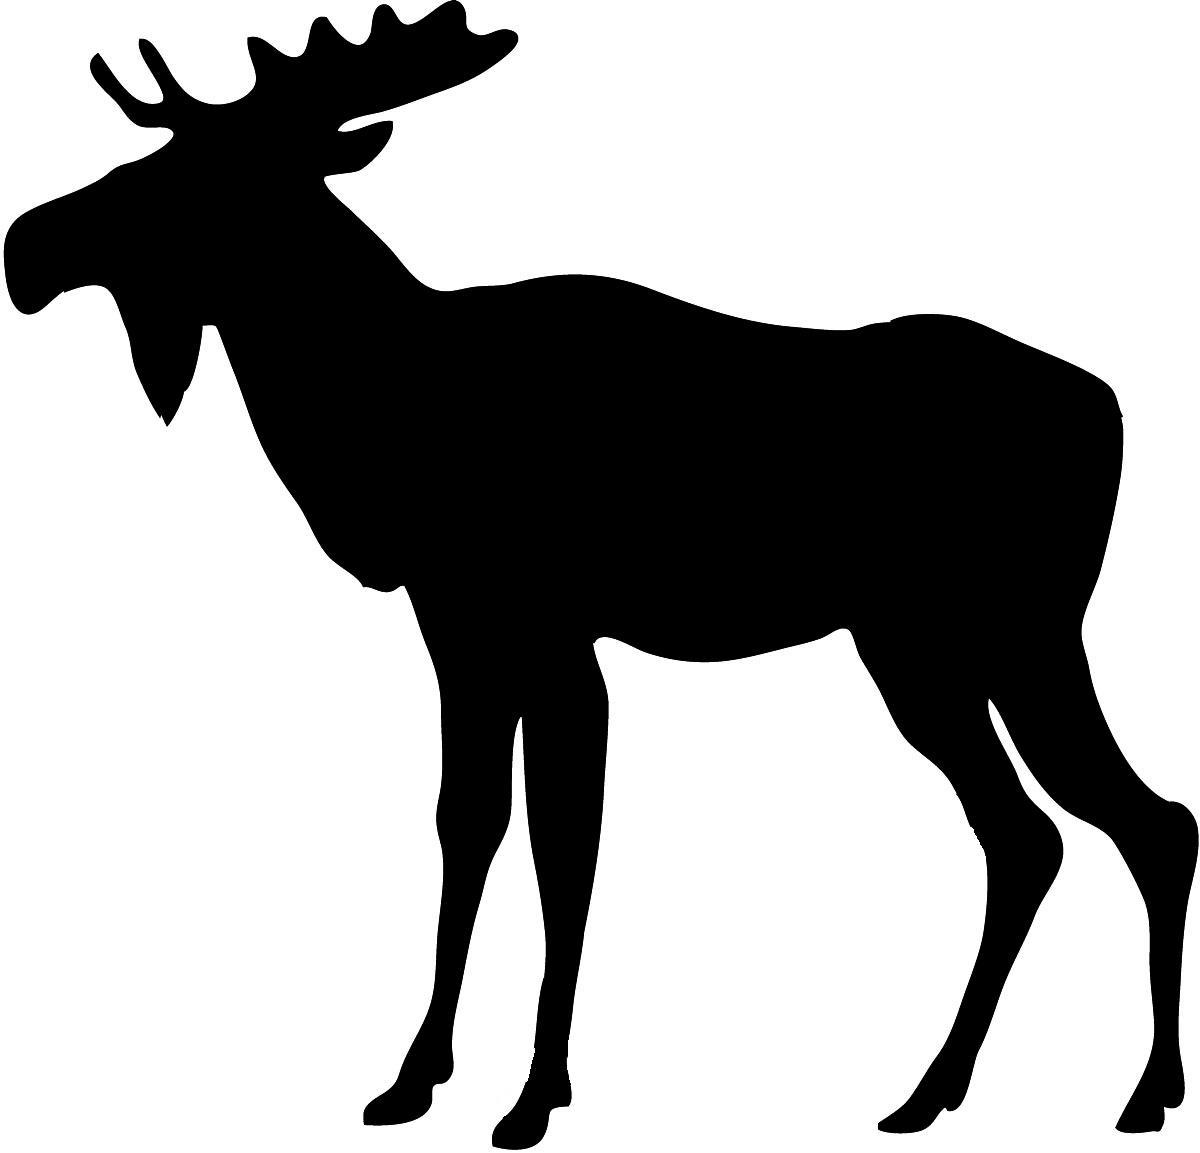 Elk Silhouette Clip Art